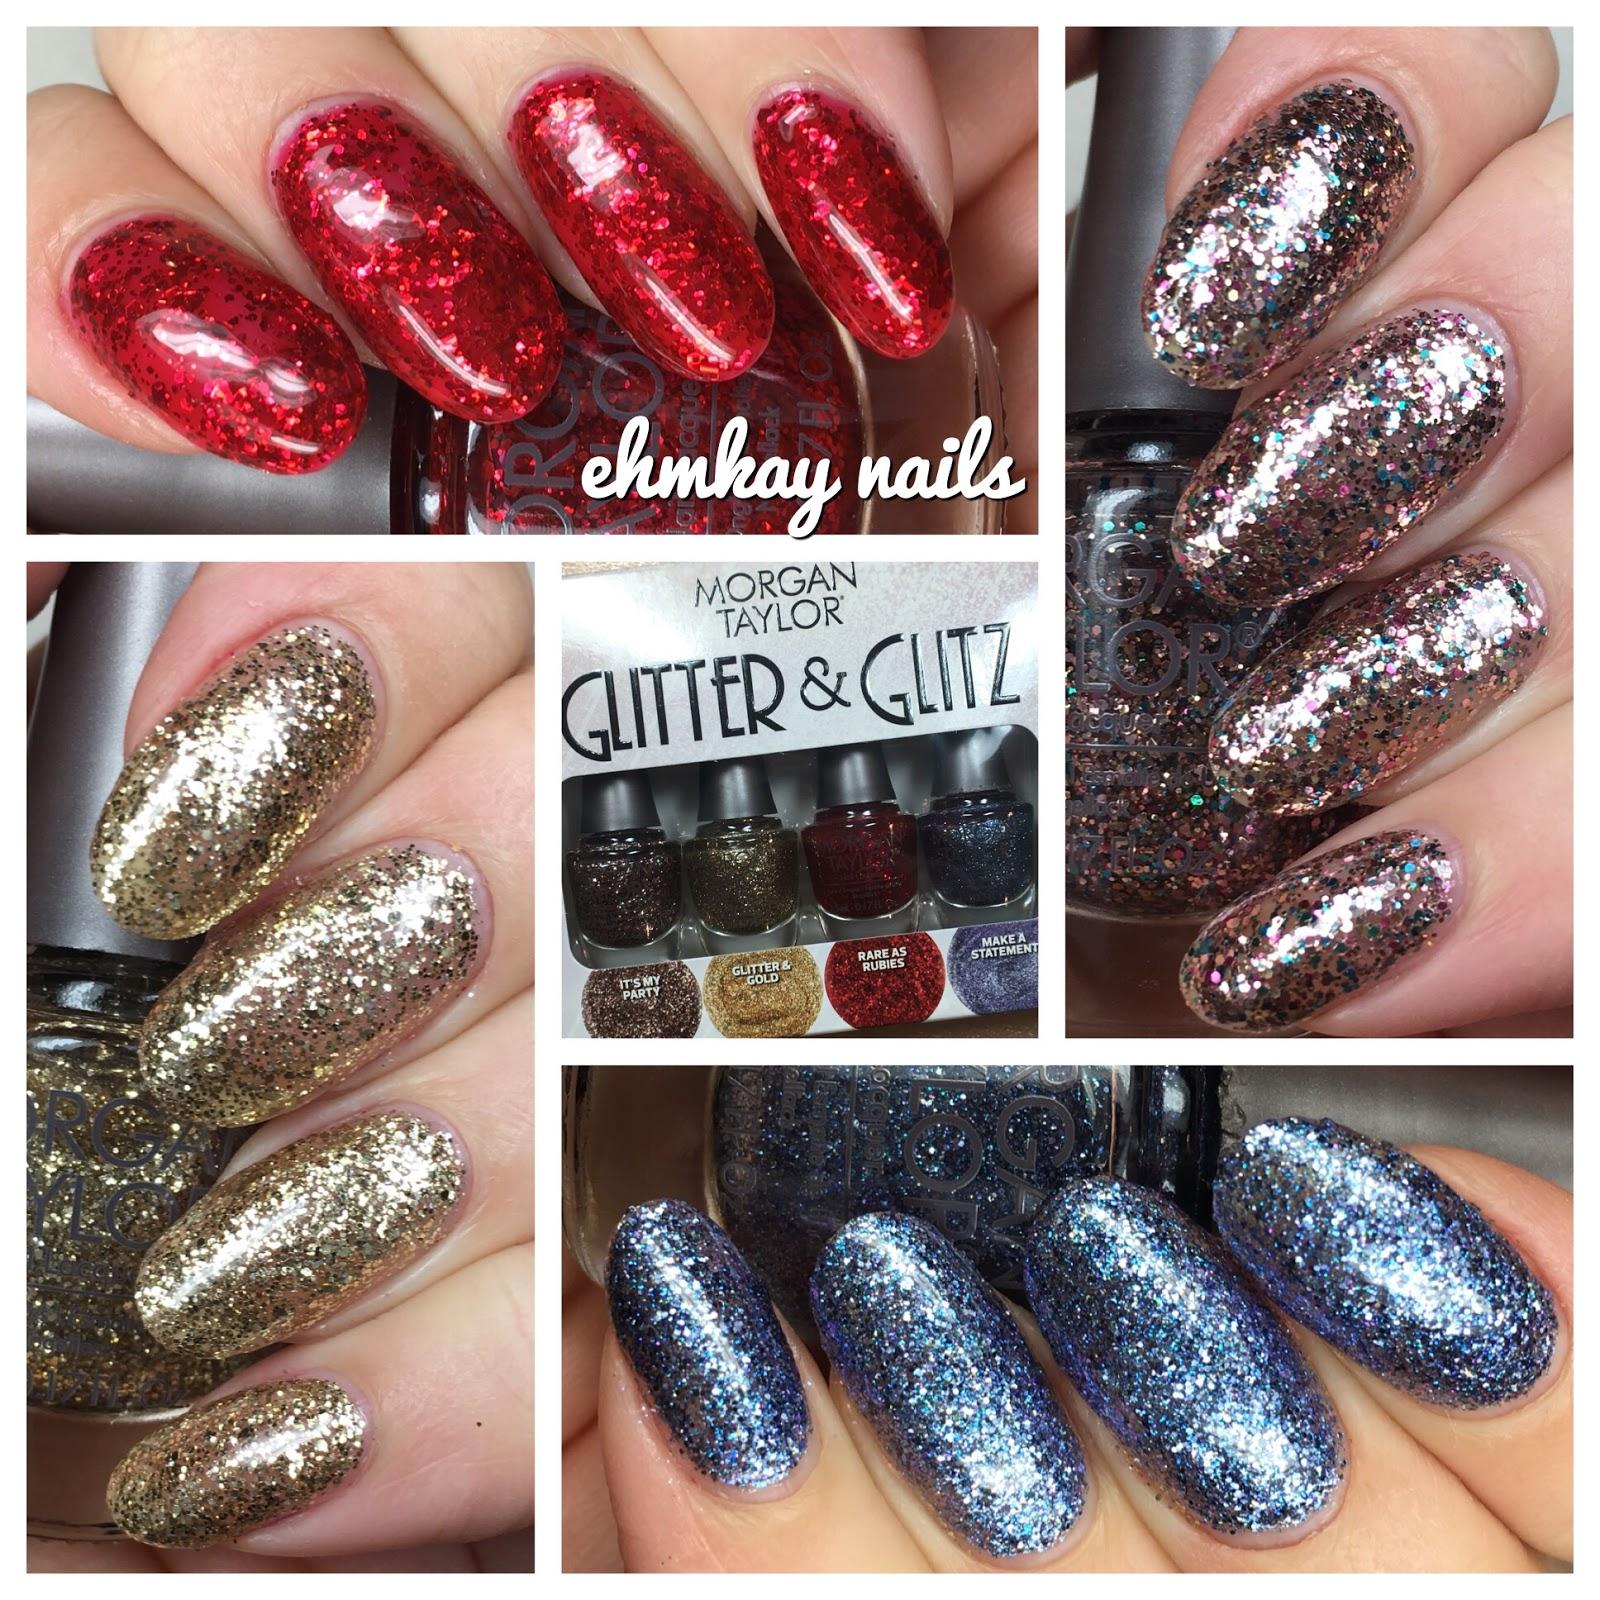 ehmkay nails: Morgan Taylor Glitter and Glitz Mini Collection